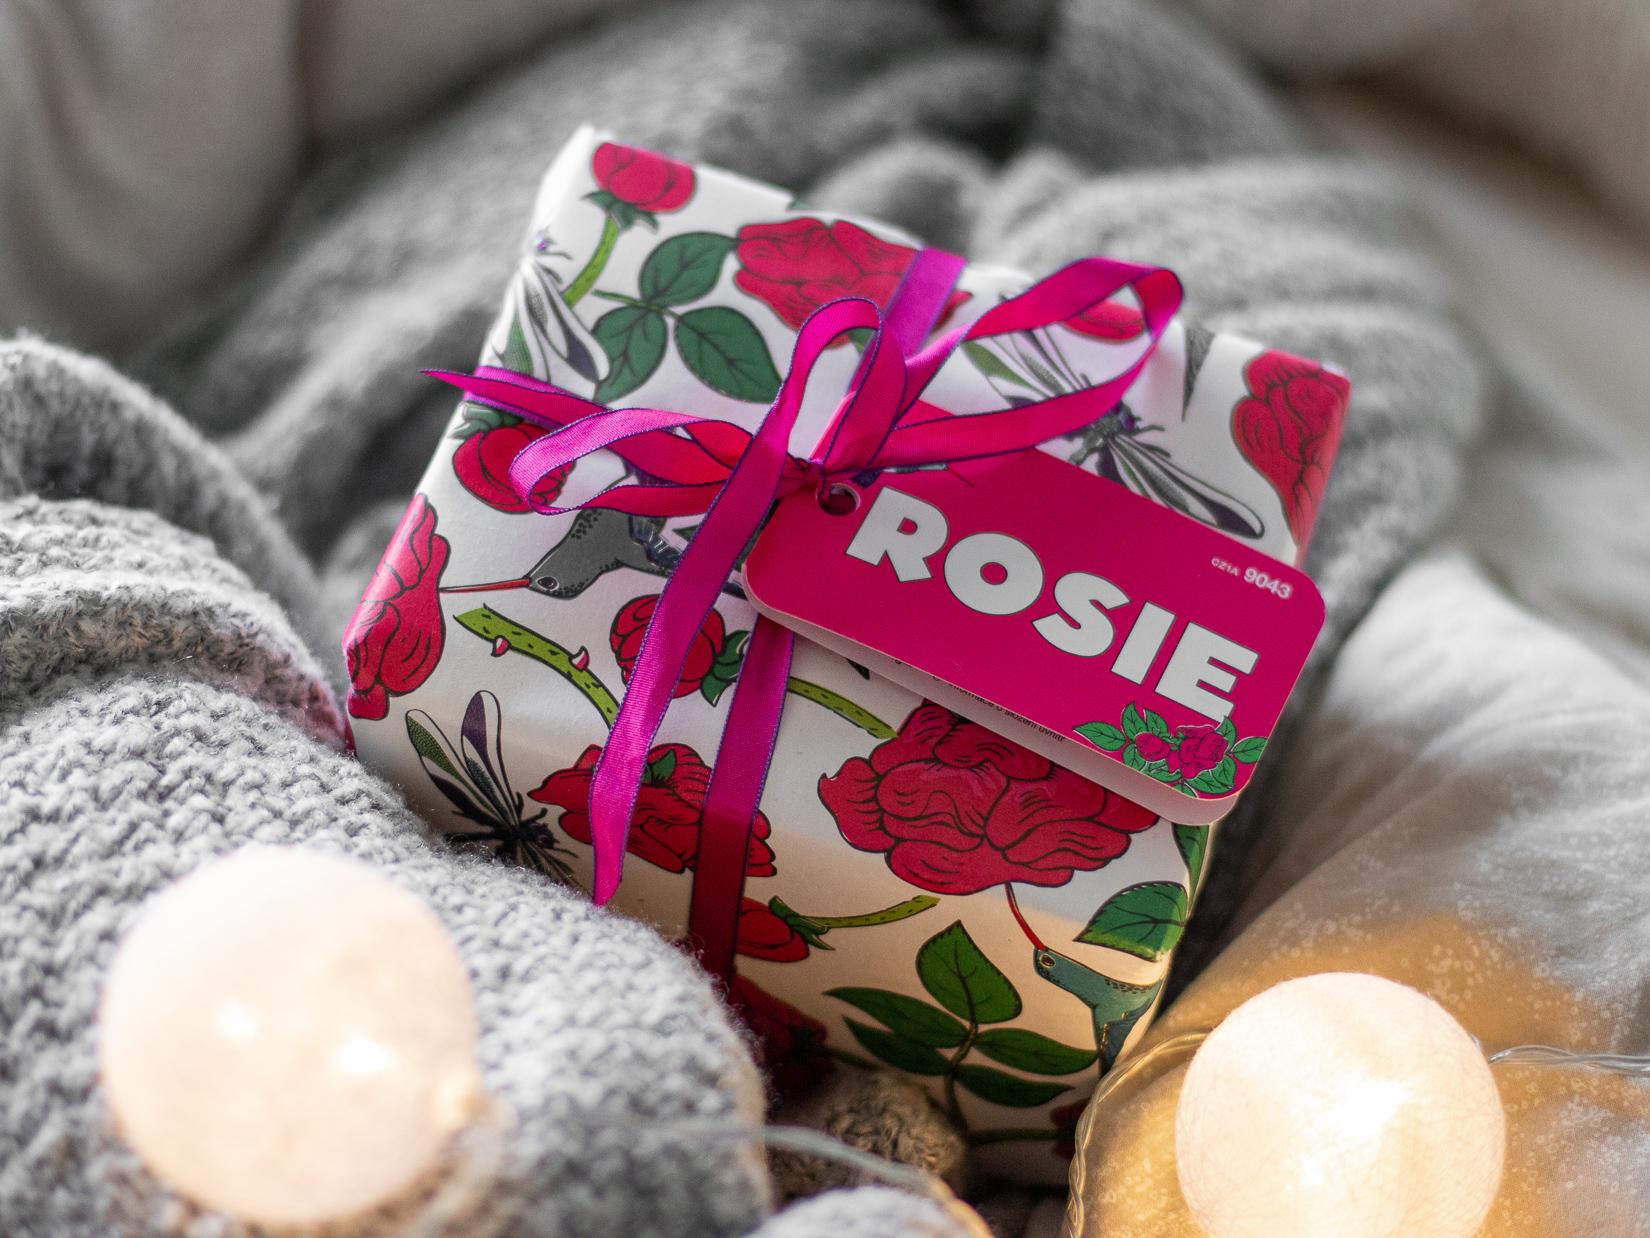 tipy na dárky vánoce 2019 lush rosie